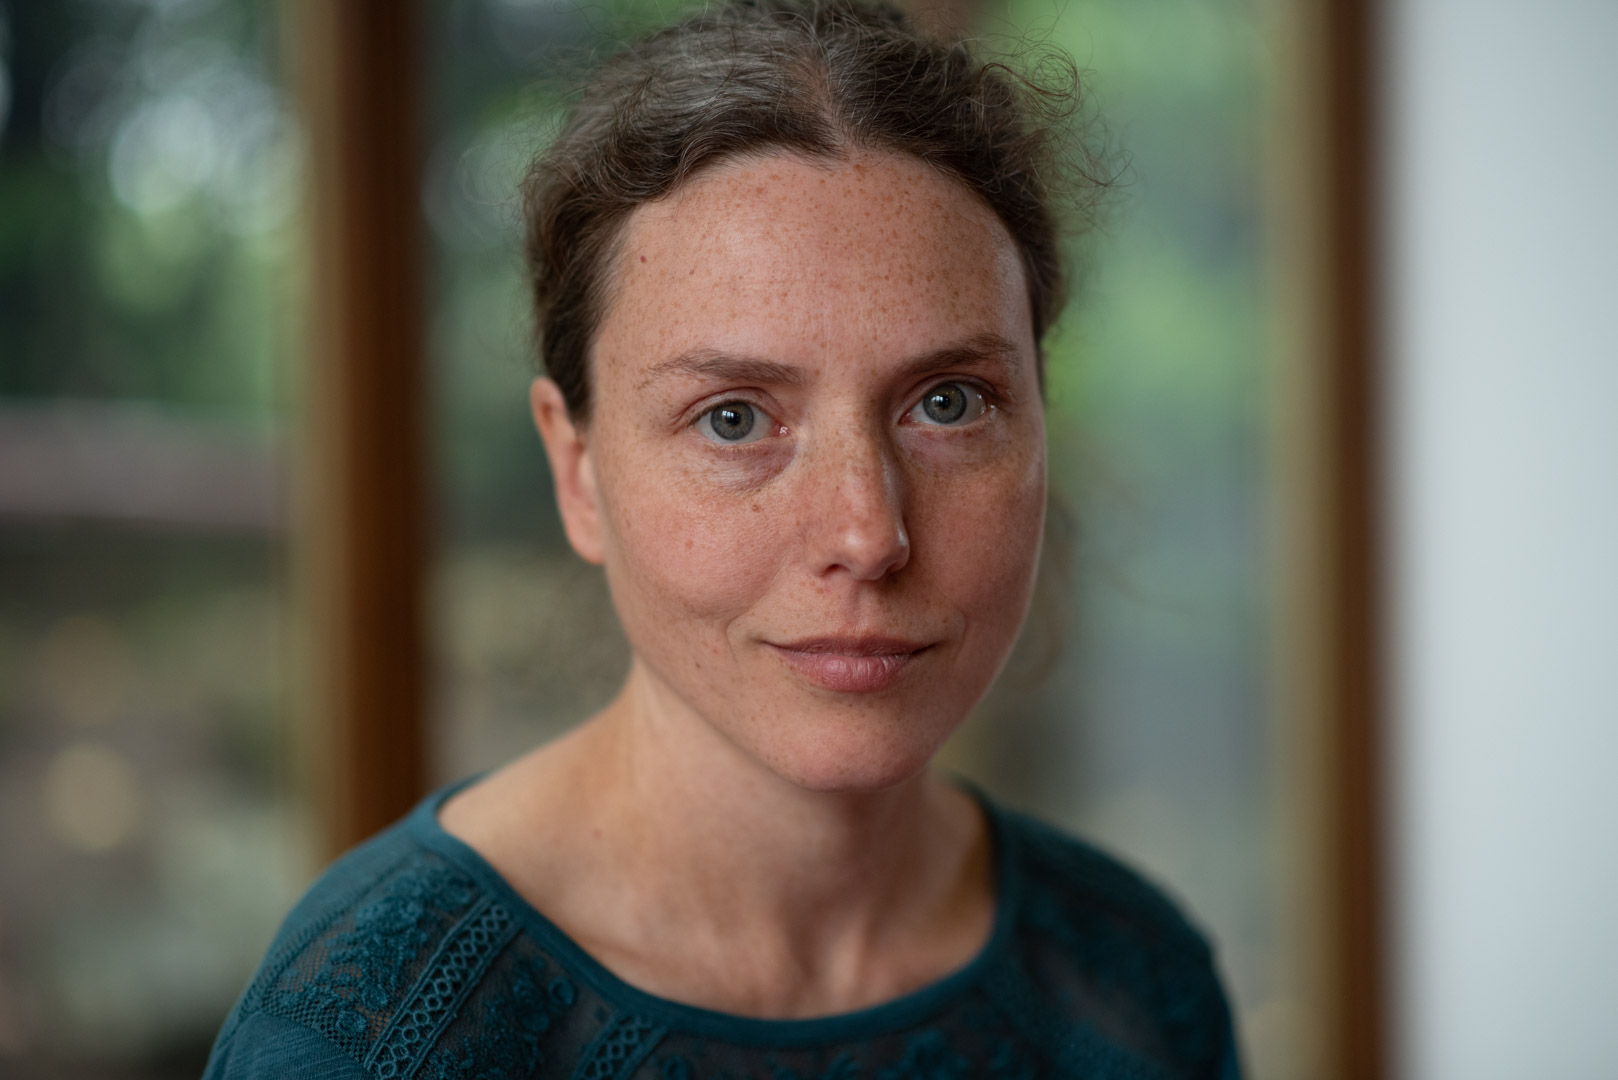 Tatiana Aitken tantric therapist wearing teal top looking at camera